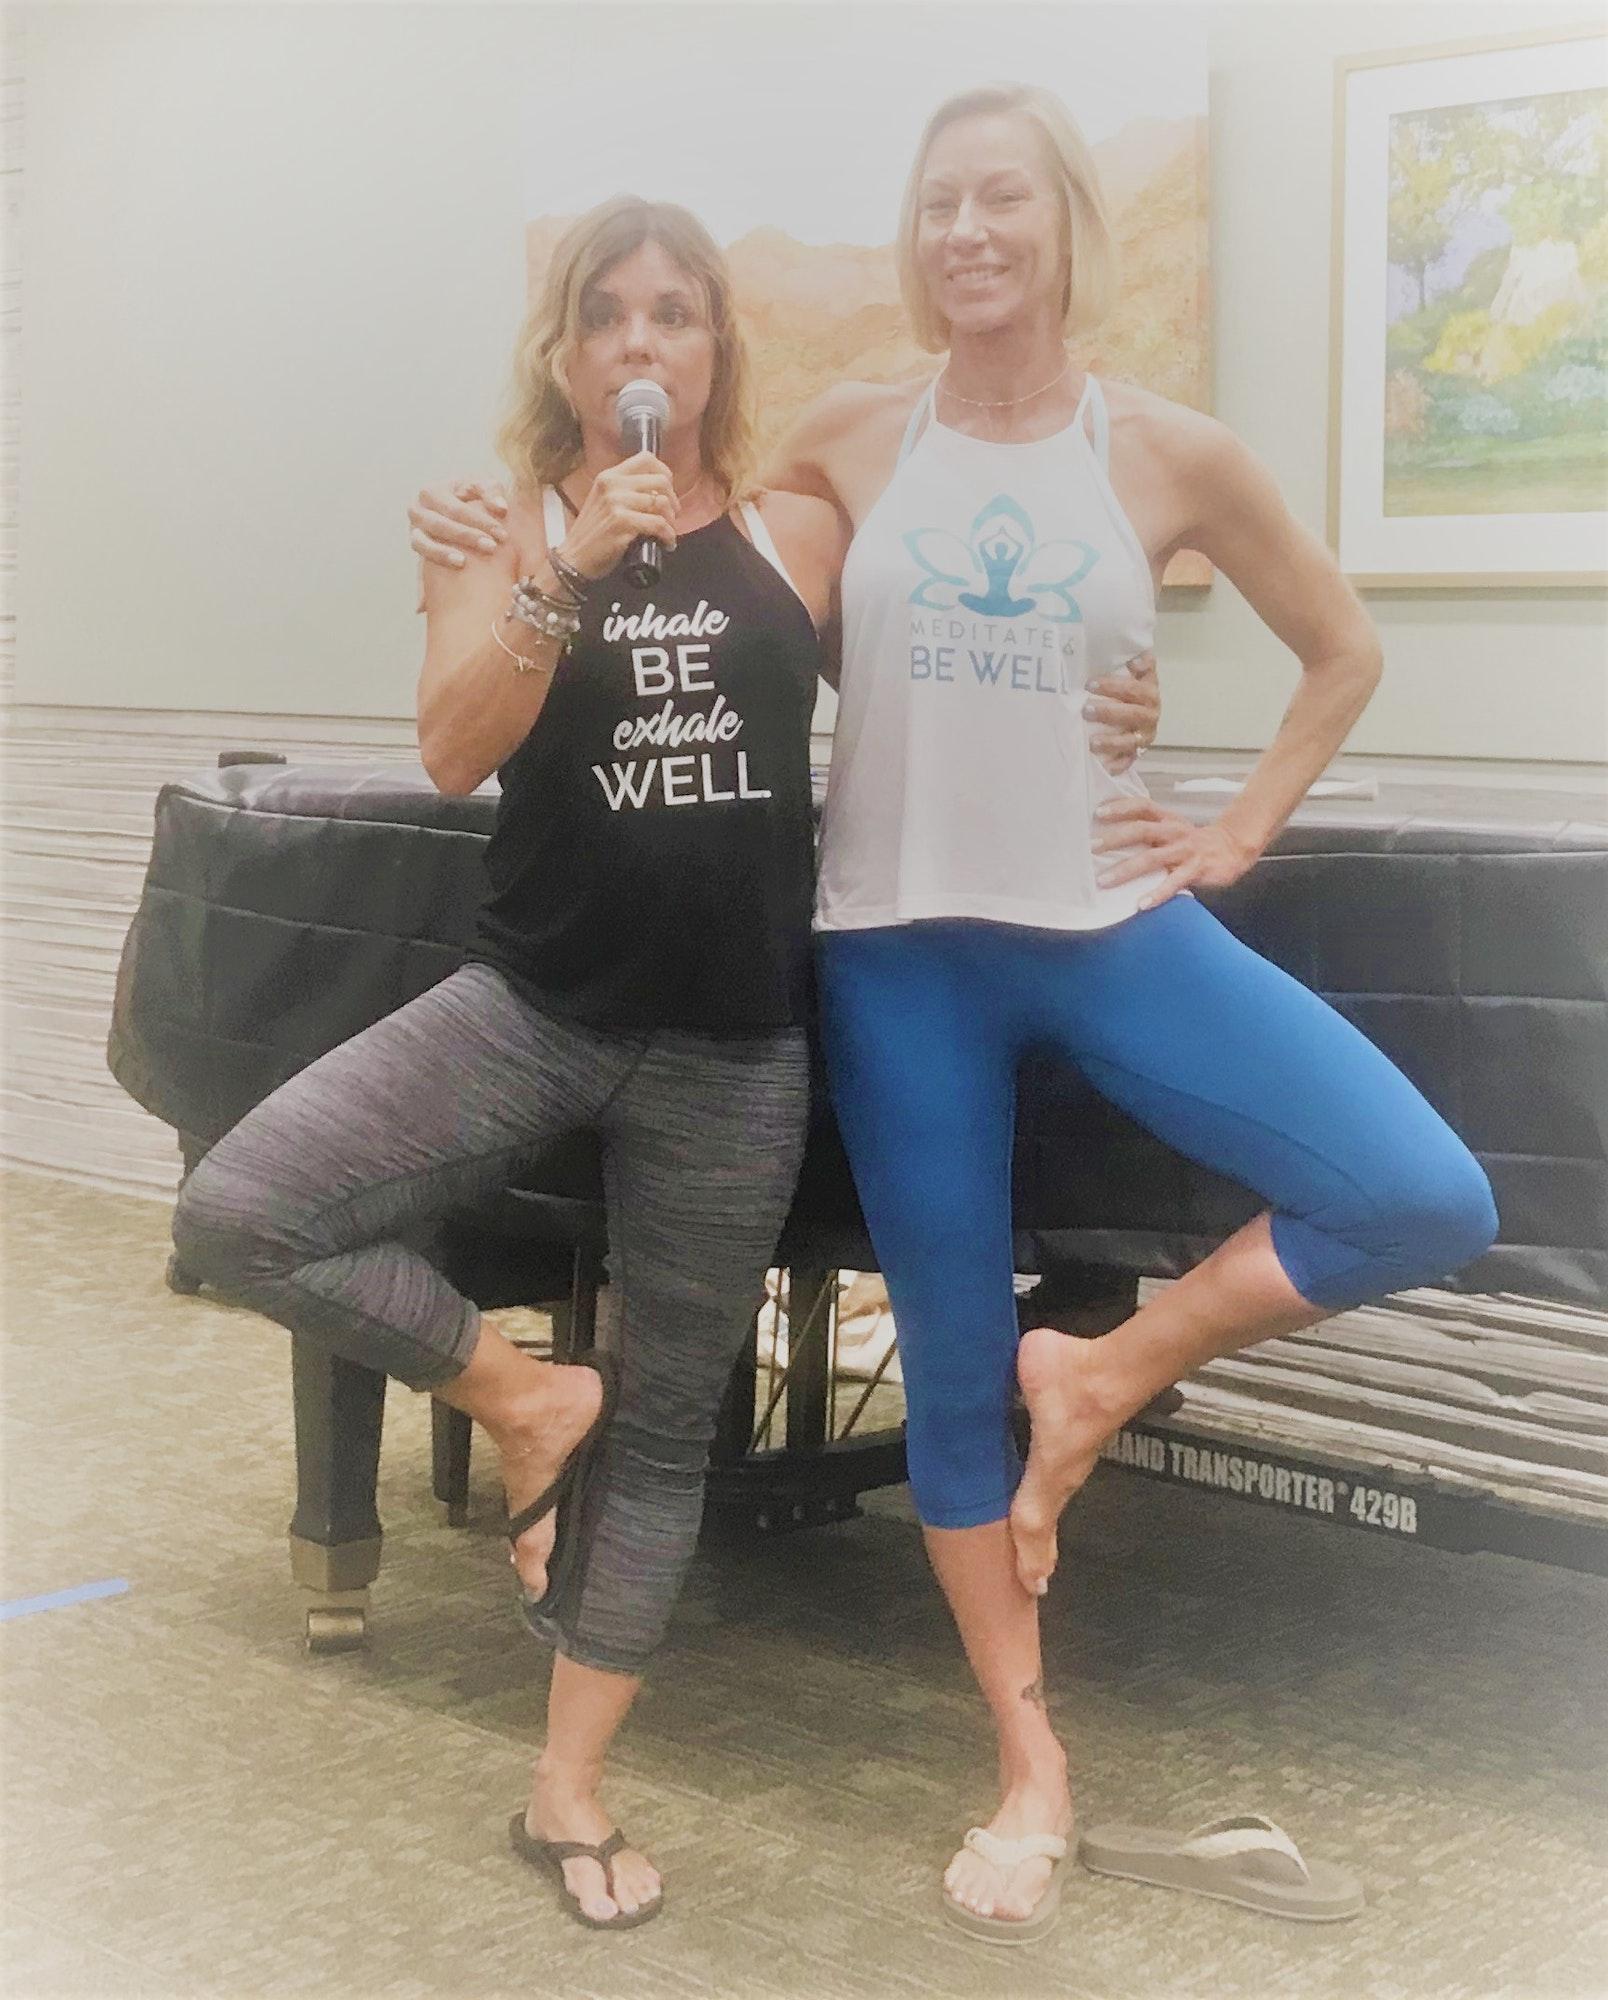 Mary and Heidi demonstrating a yoga pose